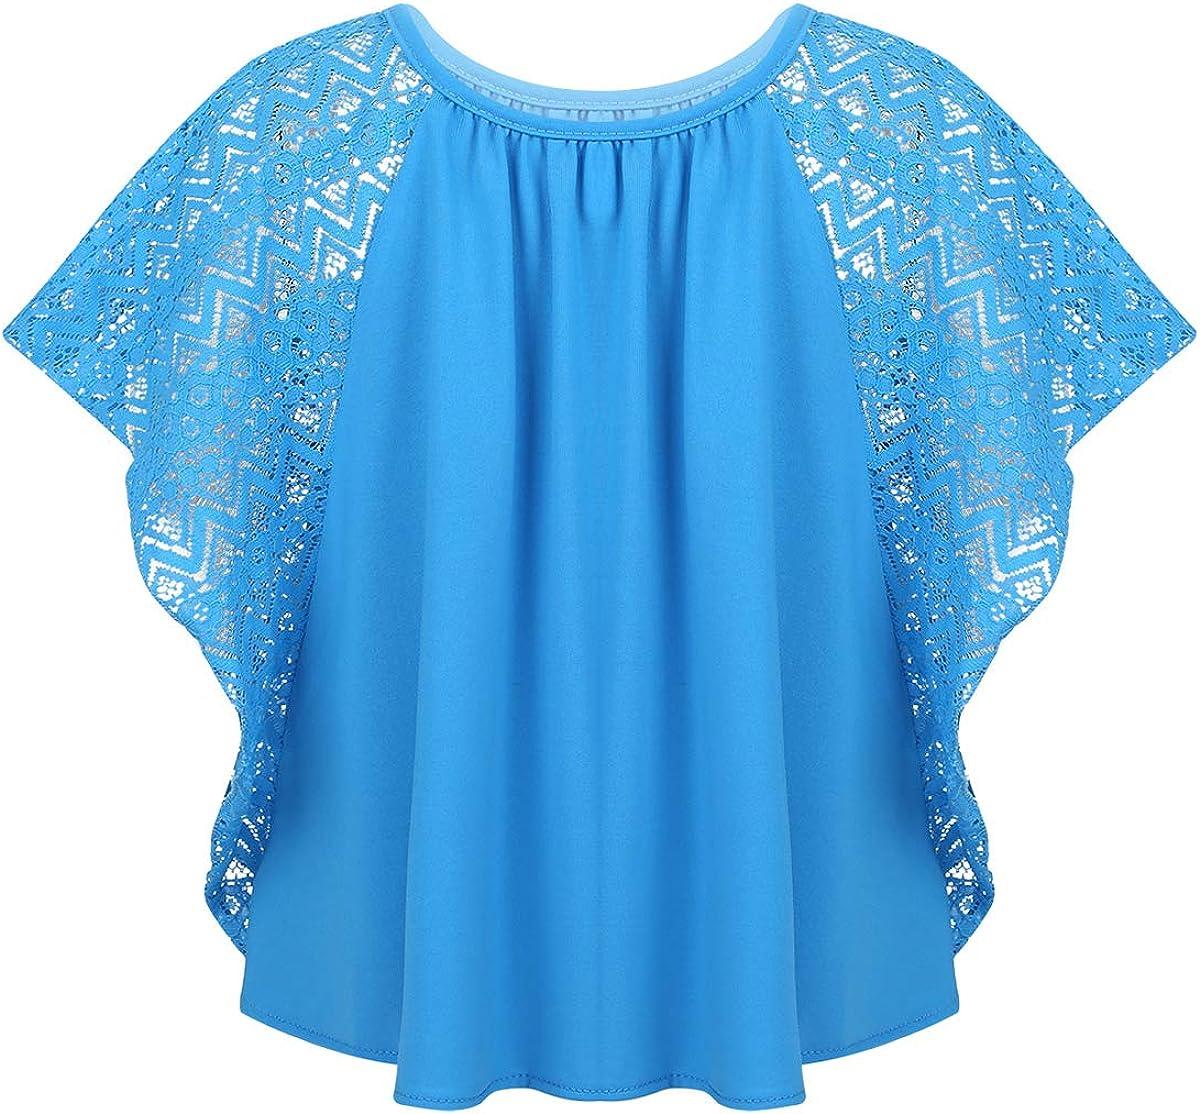 Agoky M/ädchen Fledermaus Batwing Bluse Falten Tunika T-Shirt Top Bluse Kurzarm Rundhals Sommer Shirts Casual Loose Fit